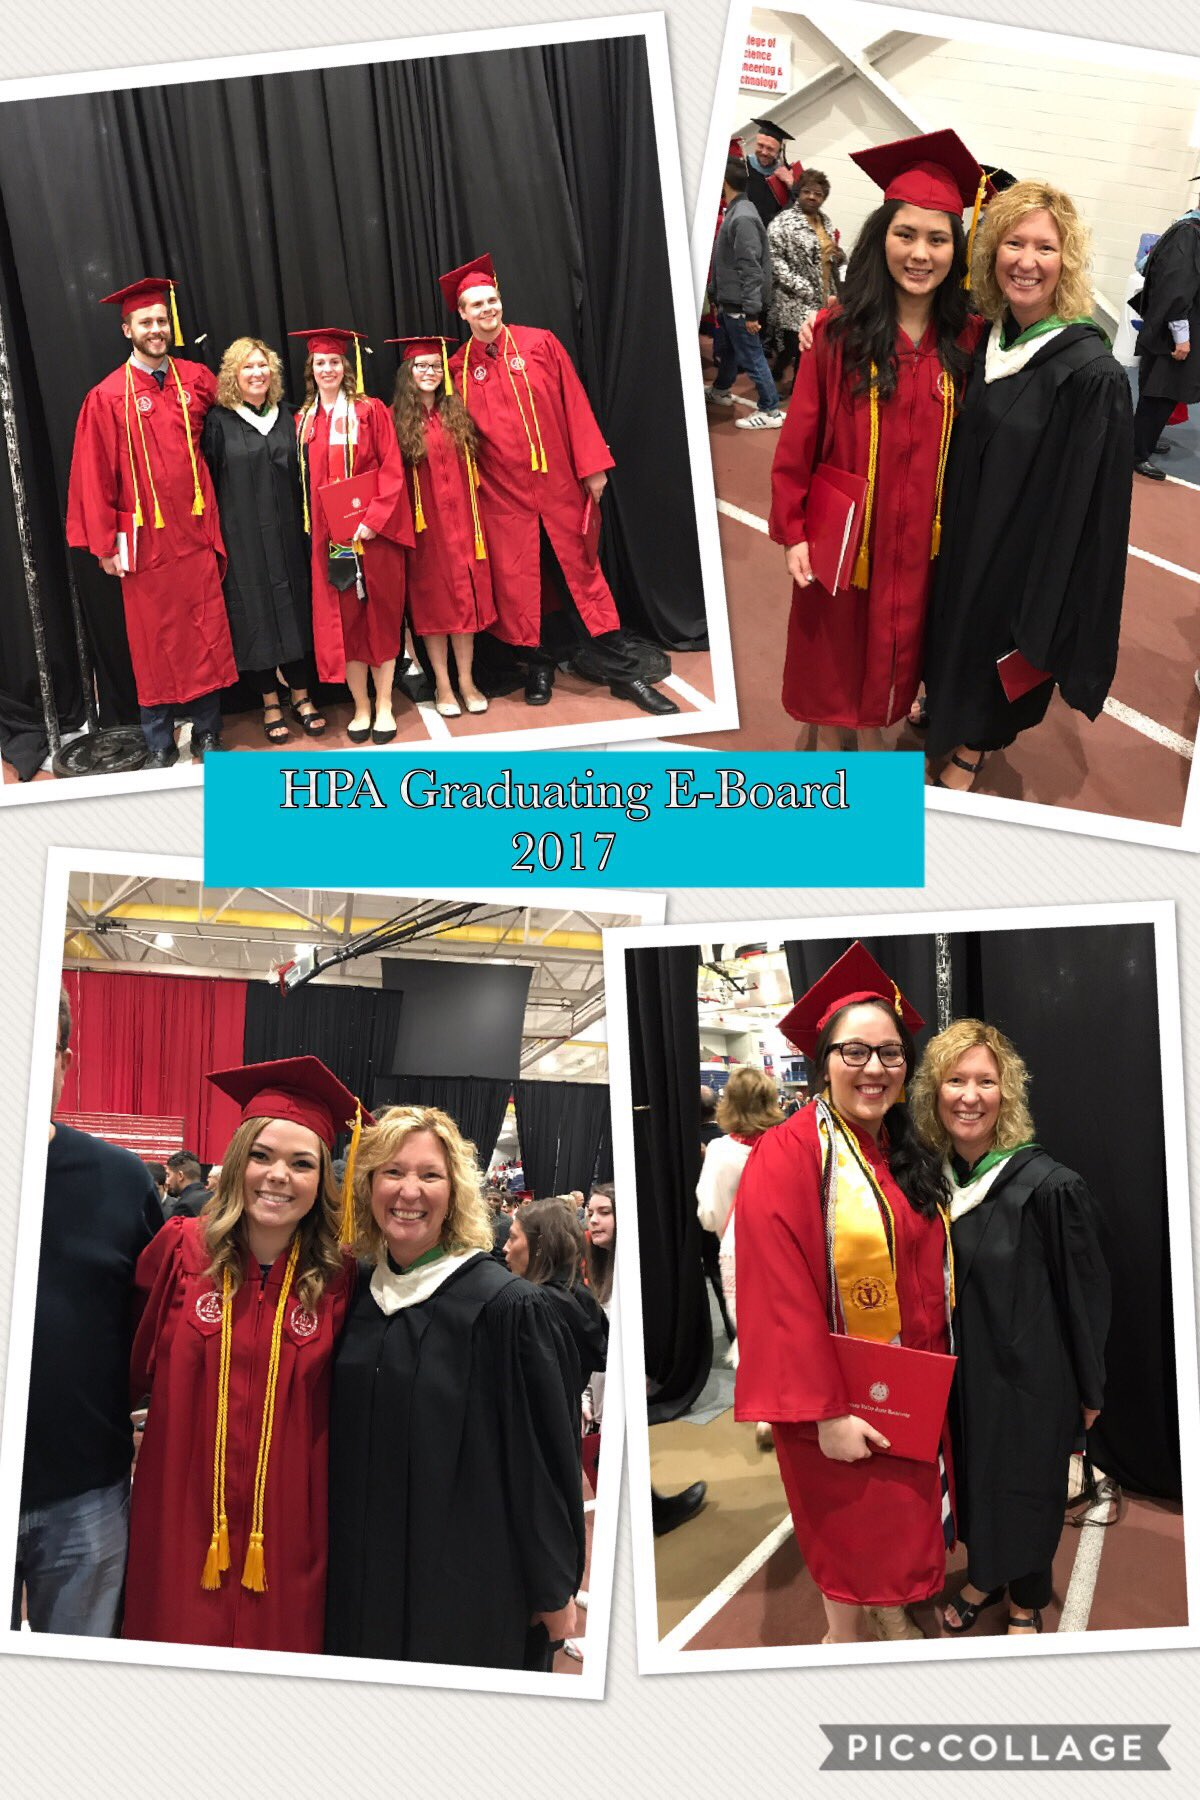 Celebrating awesome #SVSU students who will be phenomenal MD, DO, DVM, PA, PharmD, DDS, & OD students this fall. #SVGrad2017 #WeCardinal https://t.co/5WBKbpou3U